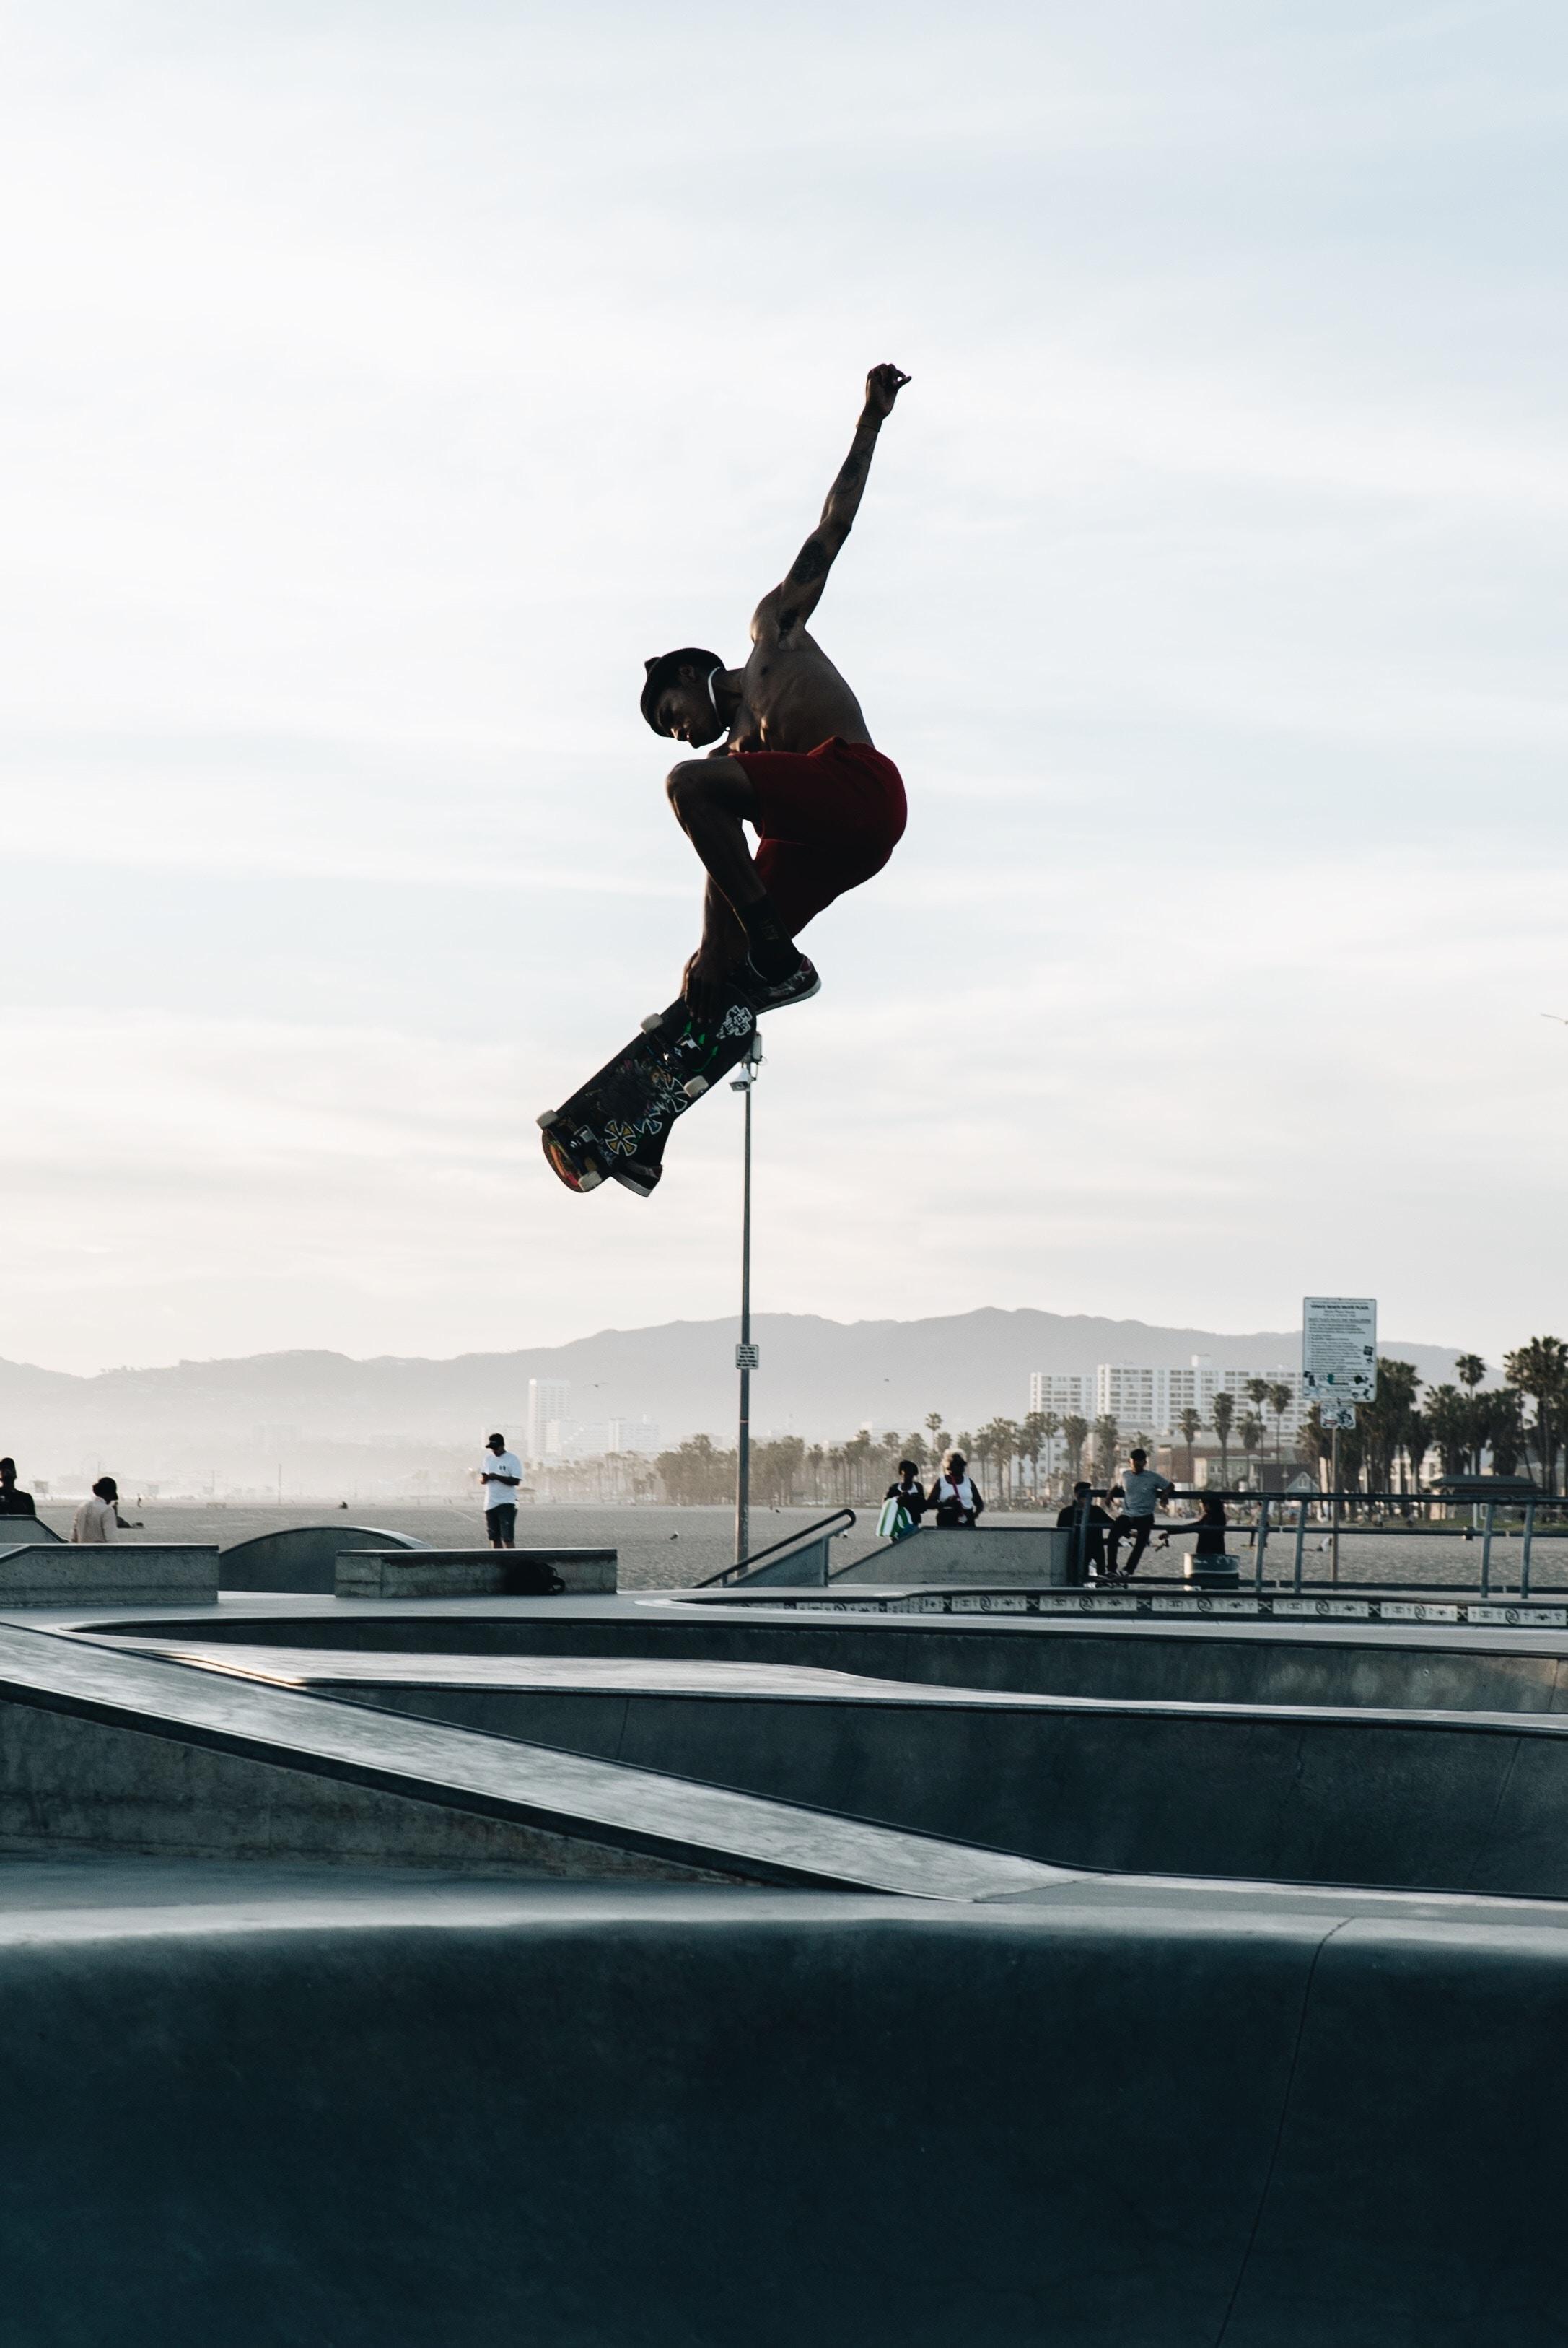 man wearing red shorts doing tricks on skateboard in skate park during daytime